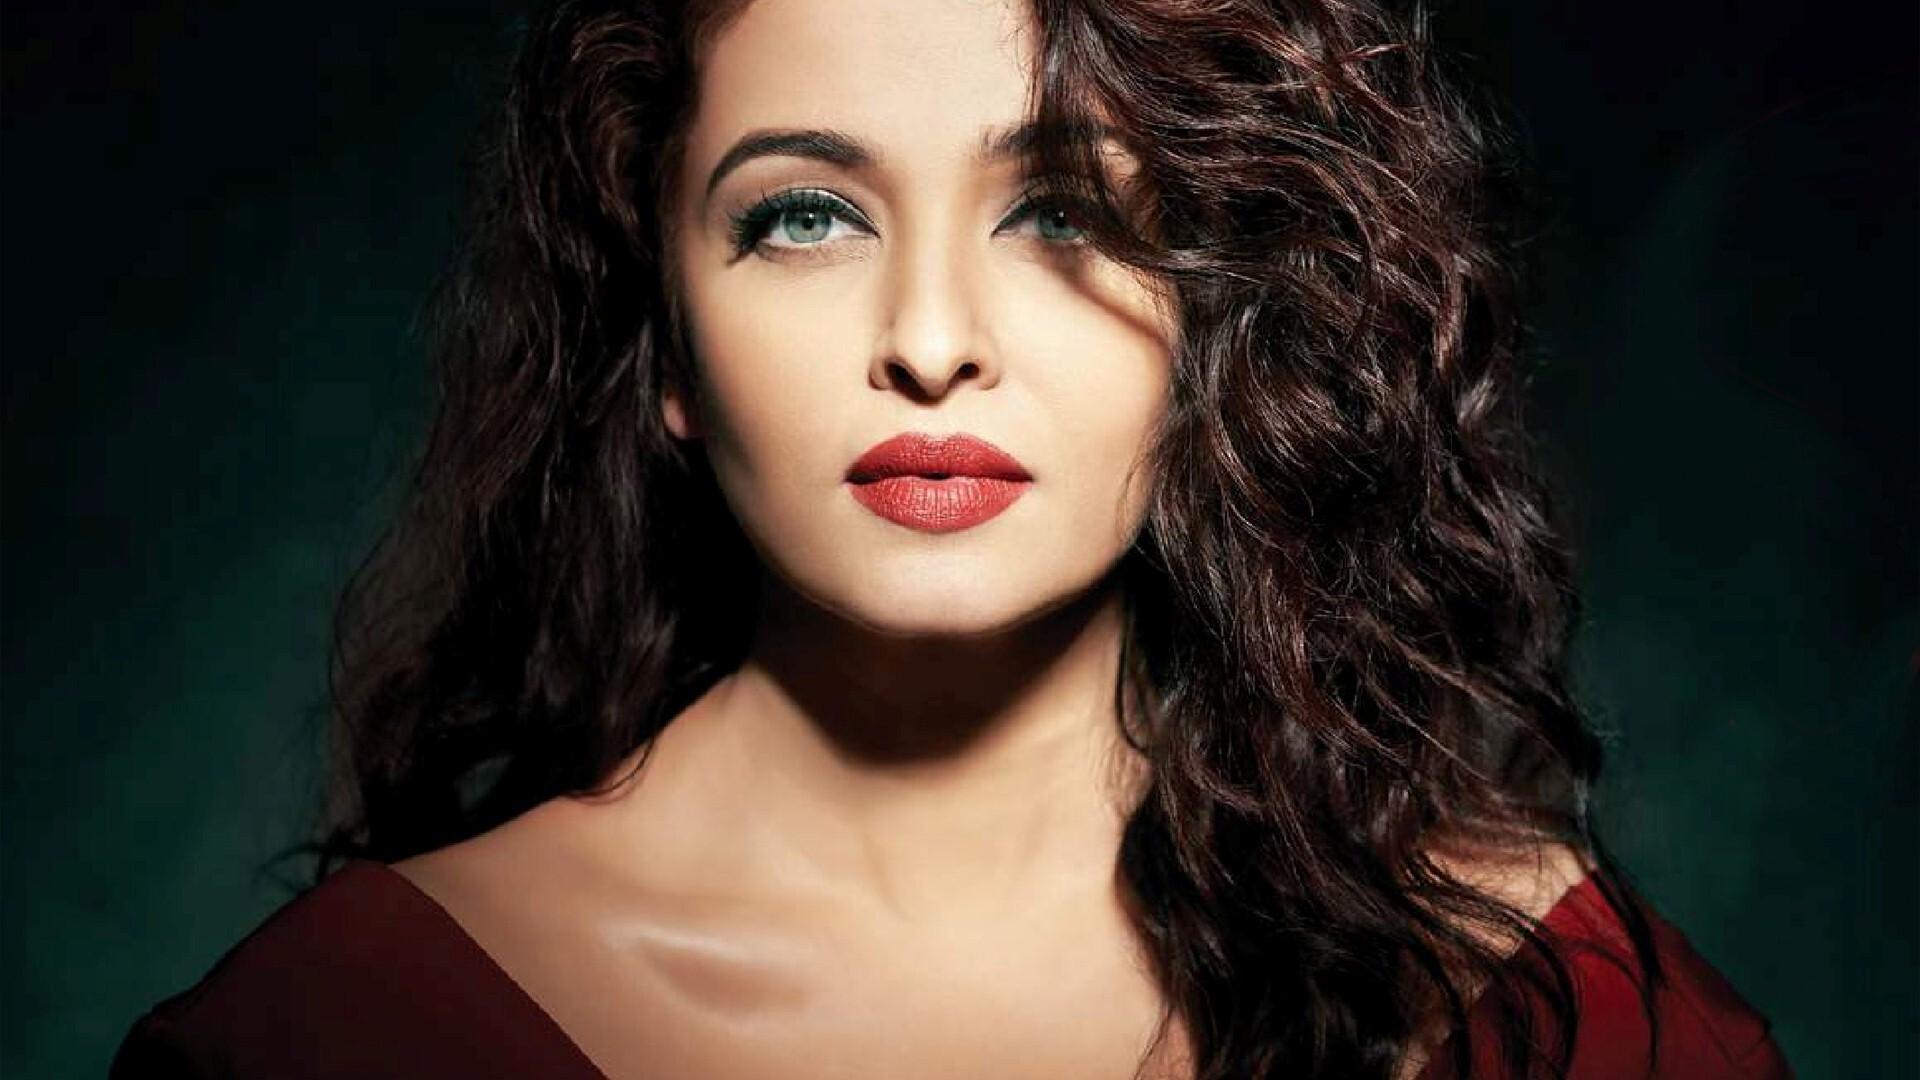 Hindi Film Heroine Aishwarya Rai Desktop Background | HD ...